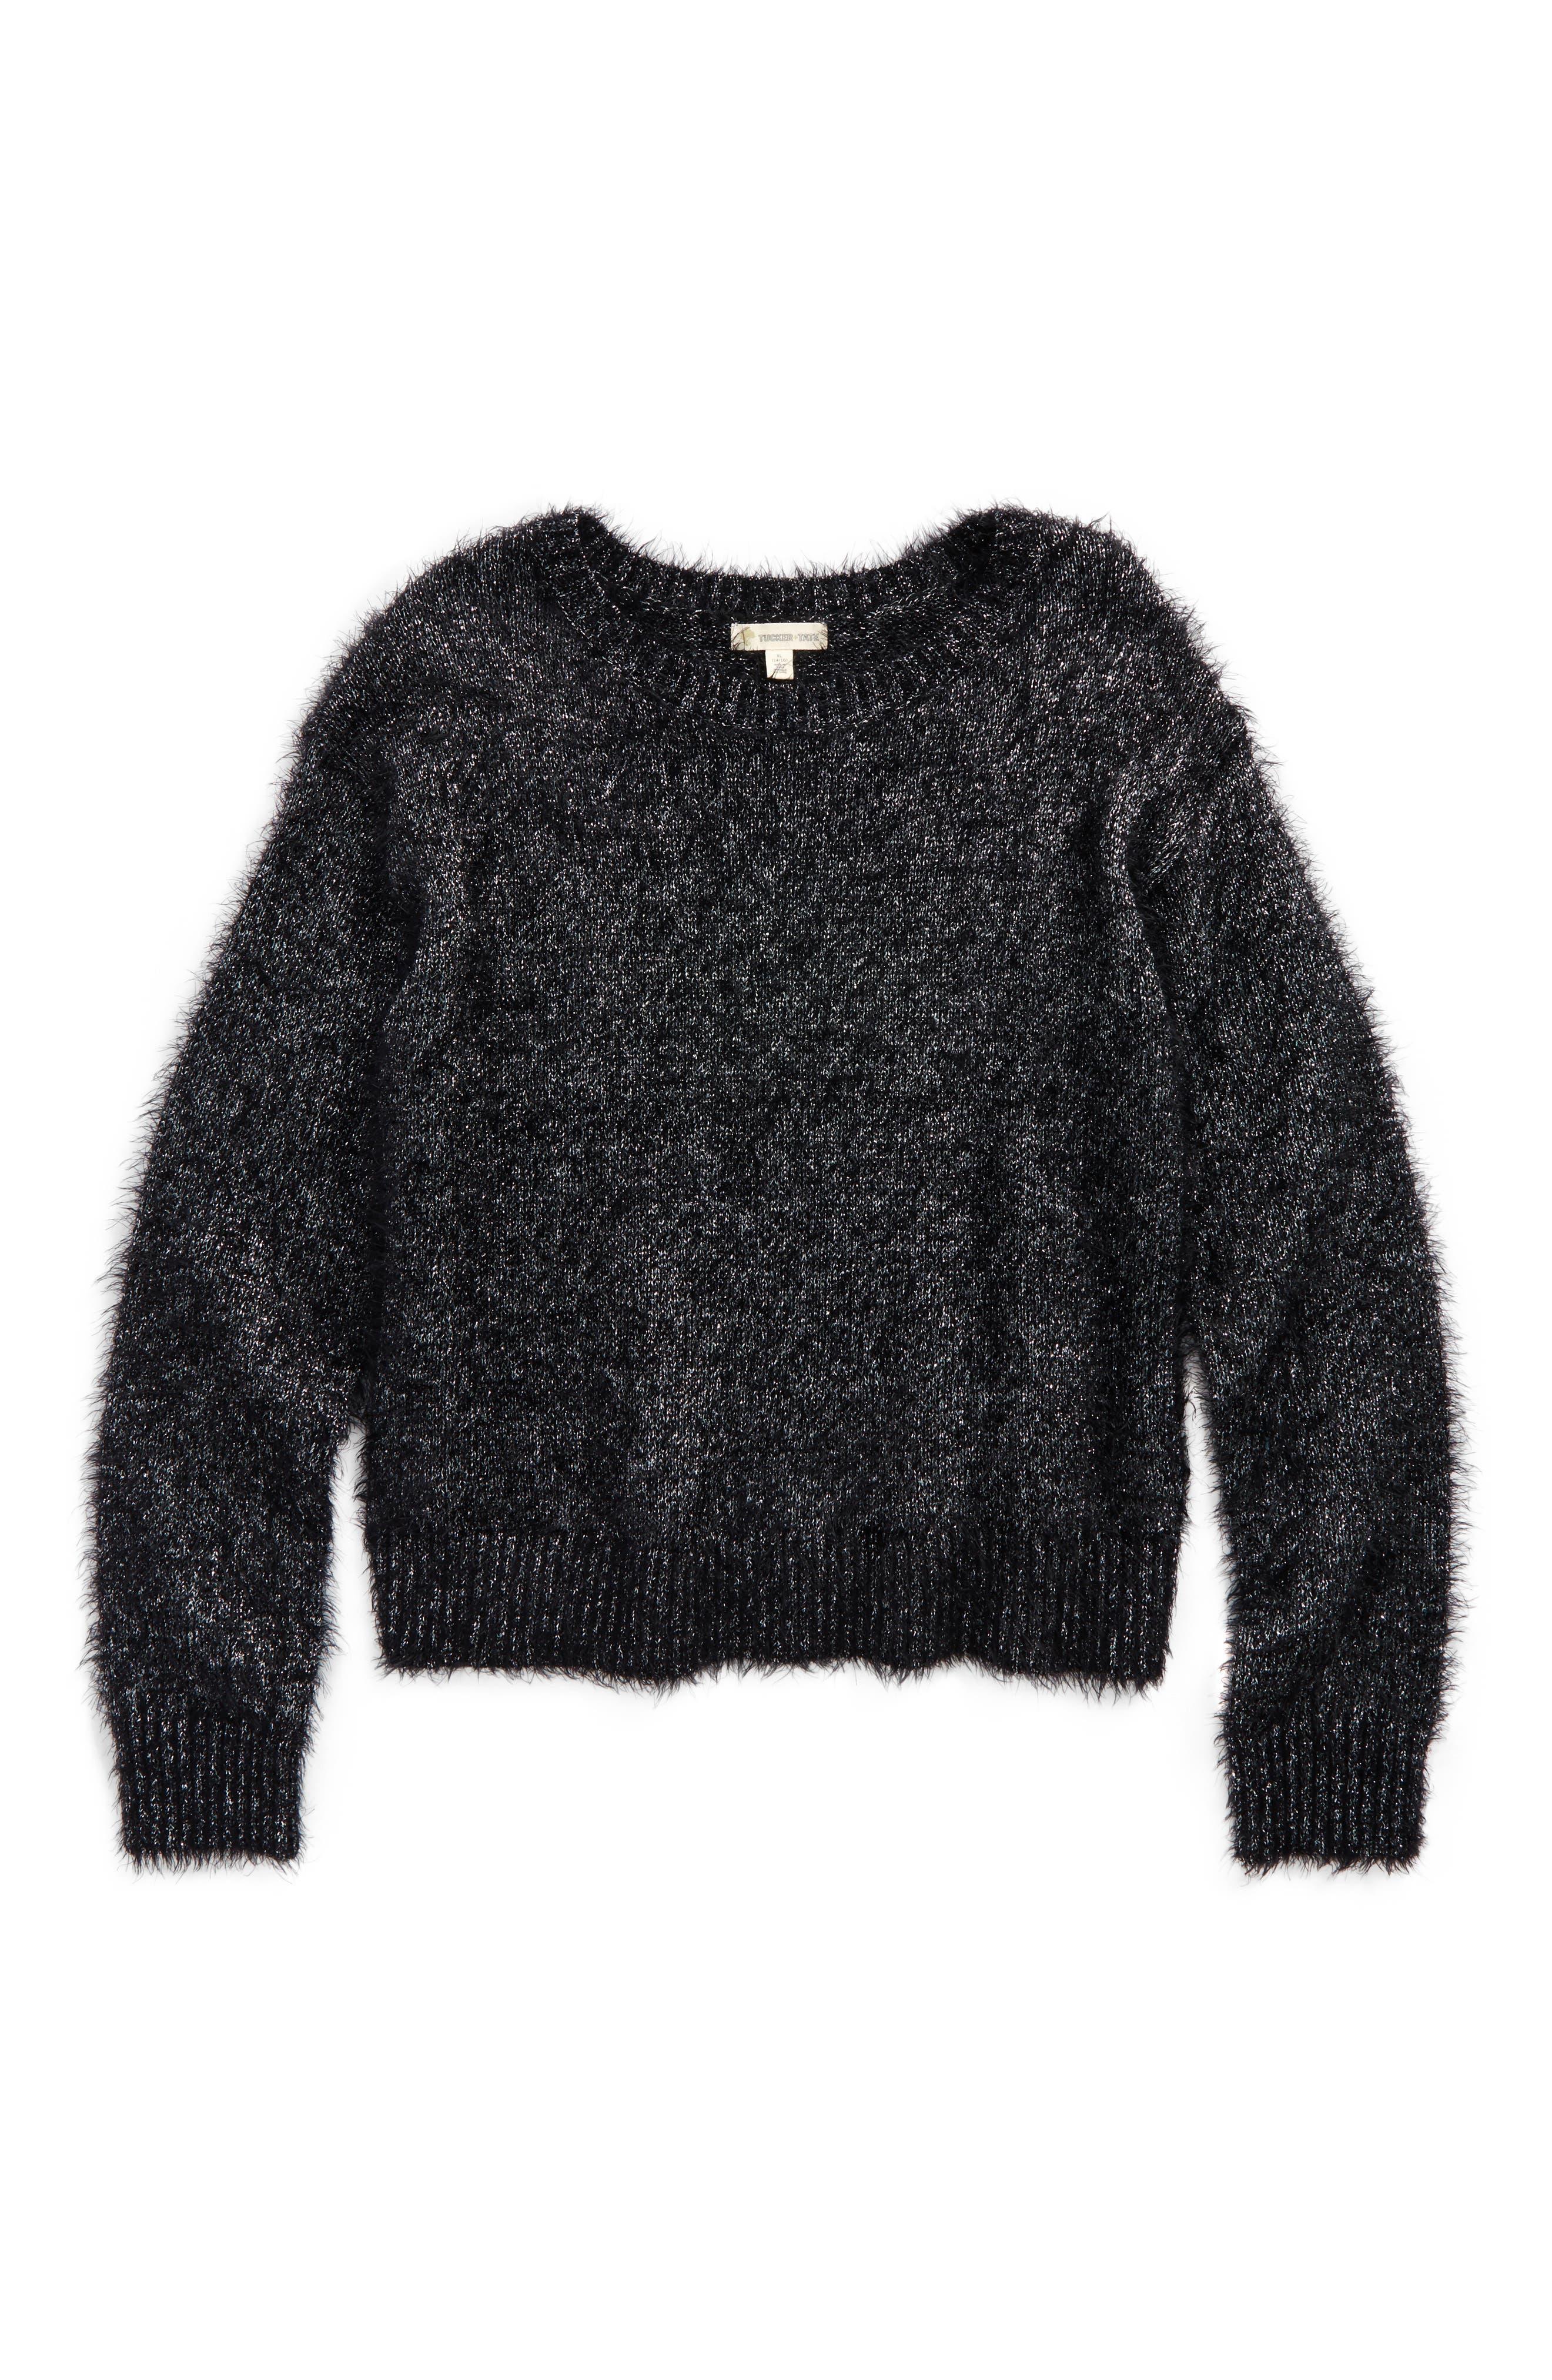 Sparkle Sweater,                             Main thumbnail 1, color,                             001